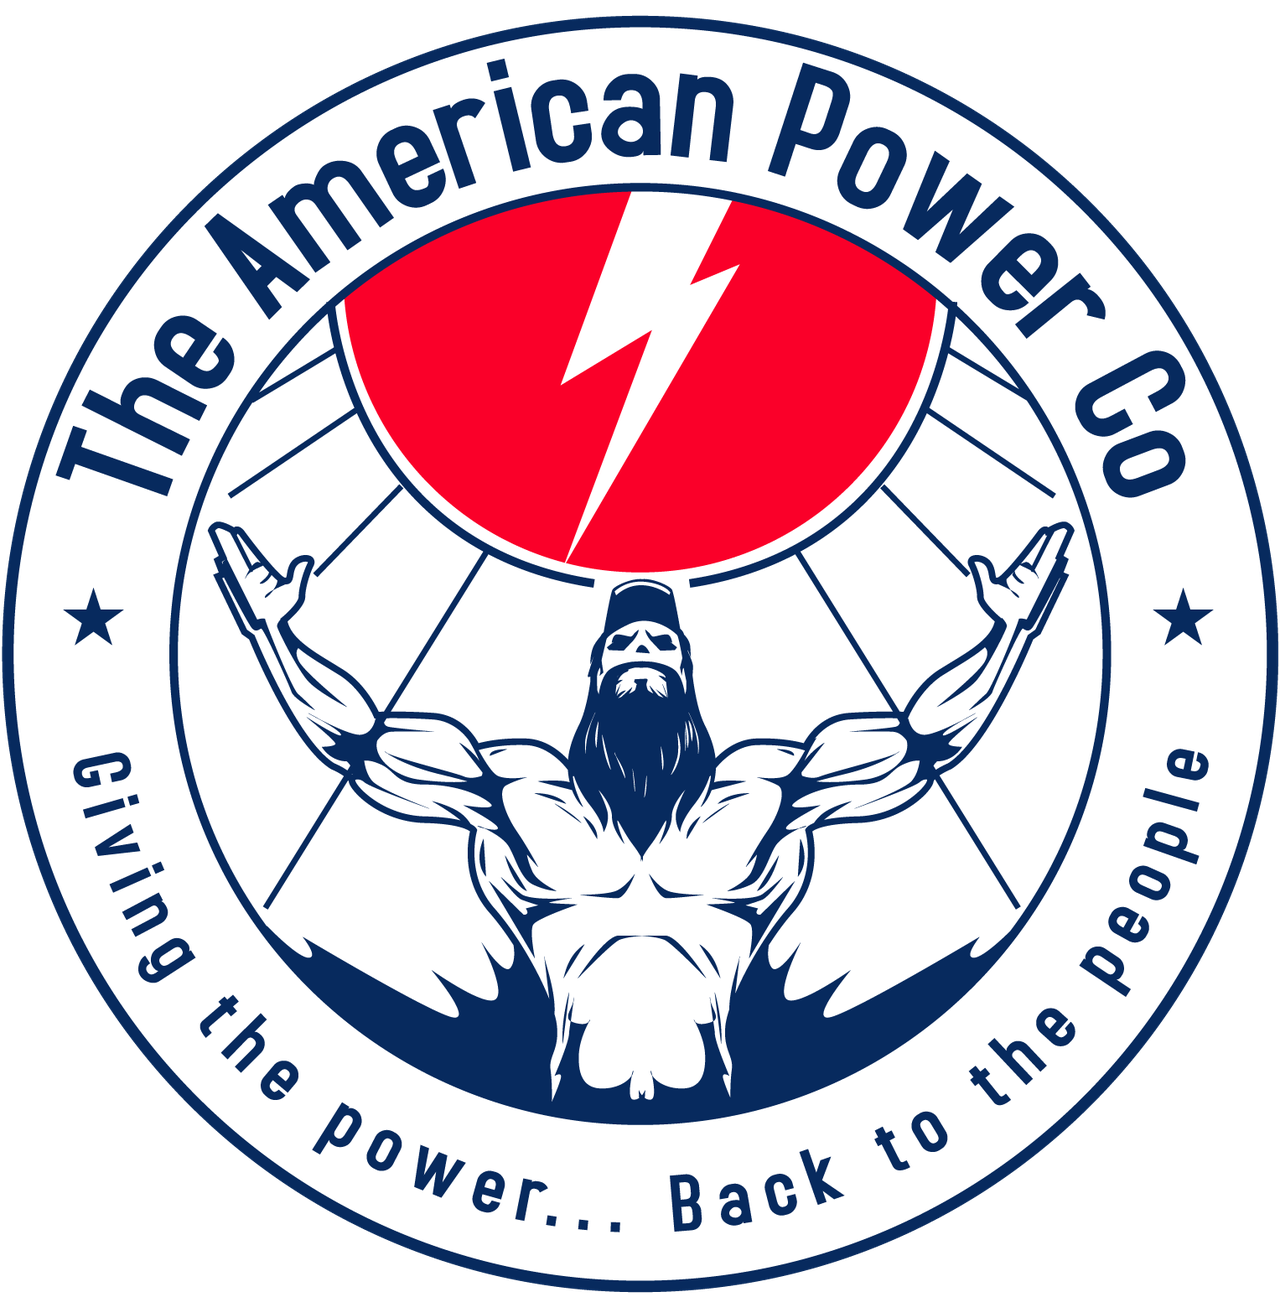 The American Power Company - renewable energy